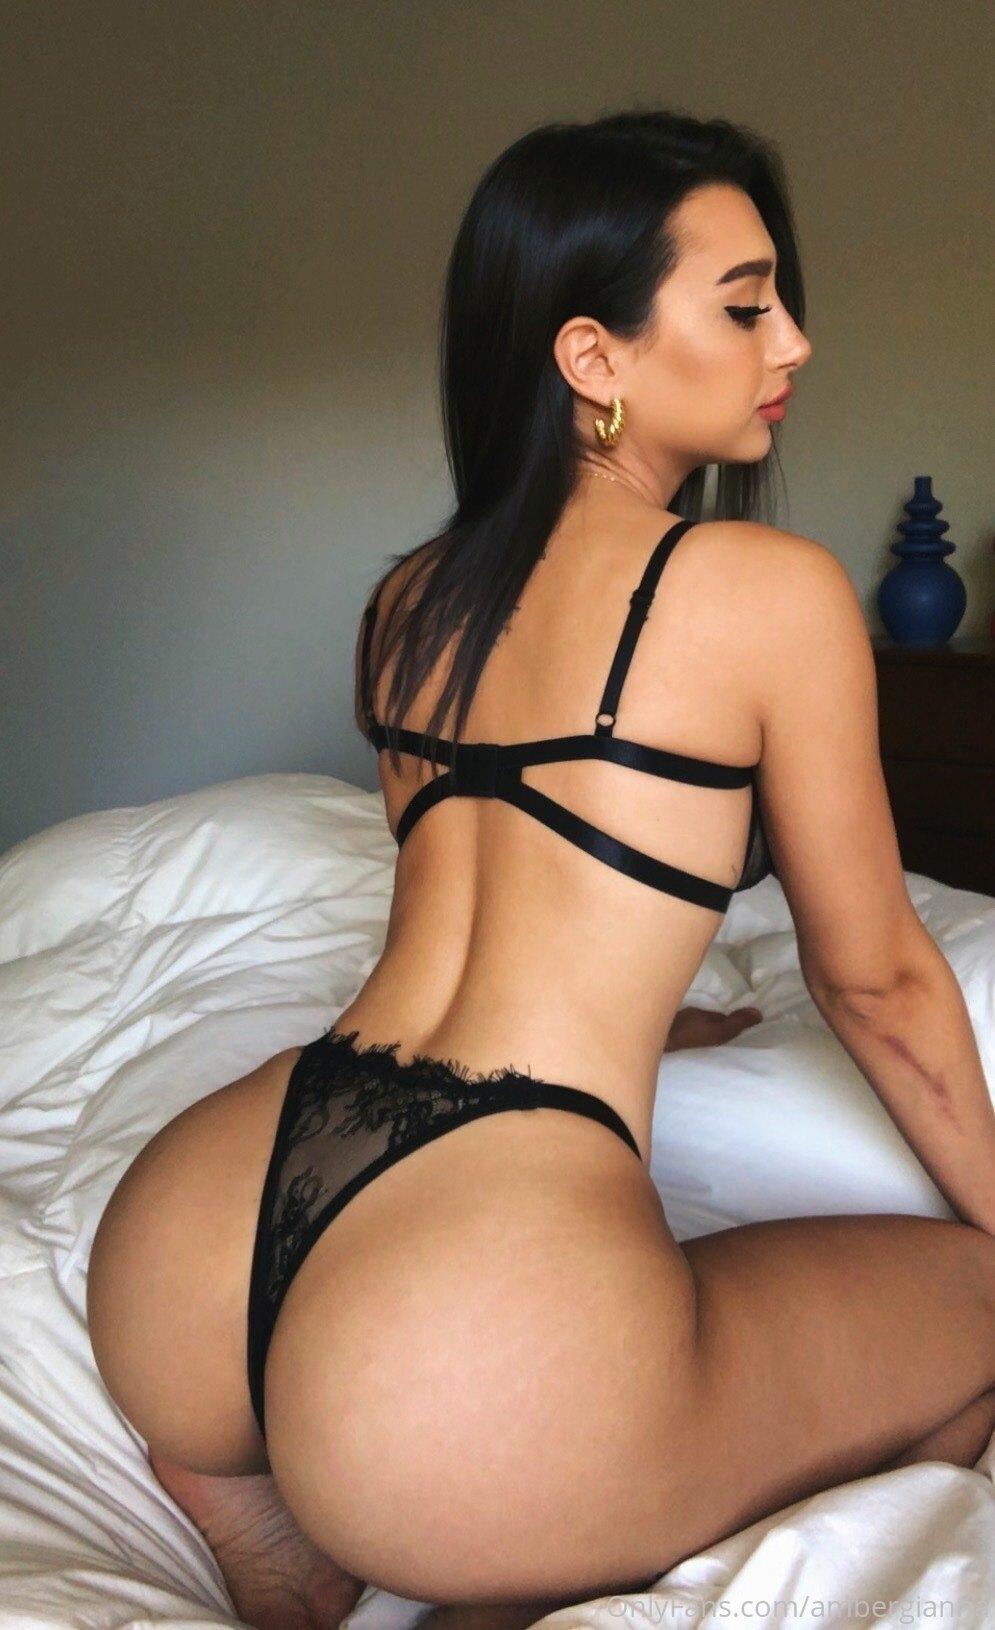 Amber Gianna Leaked 0132